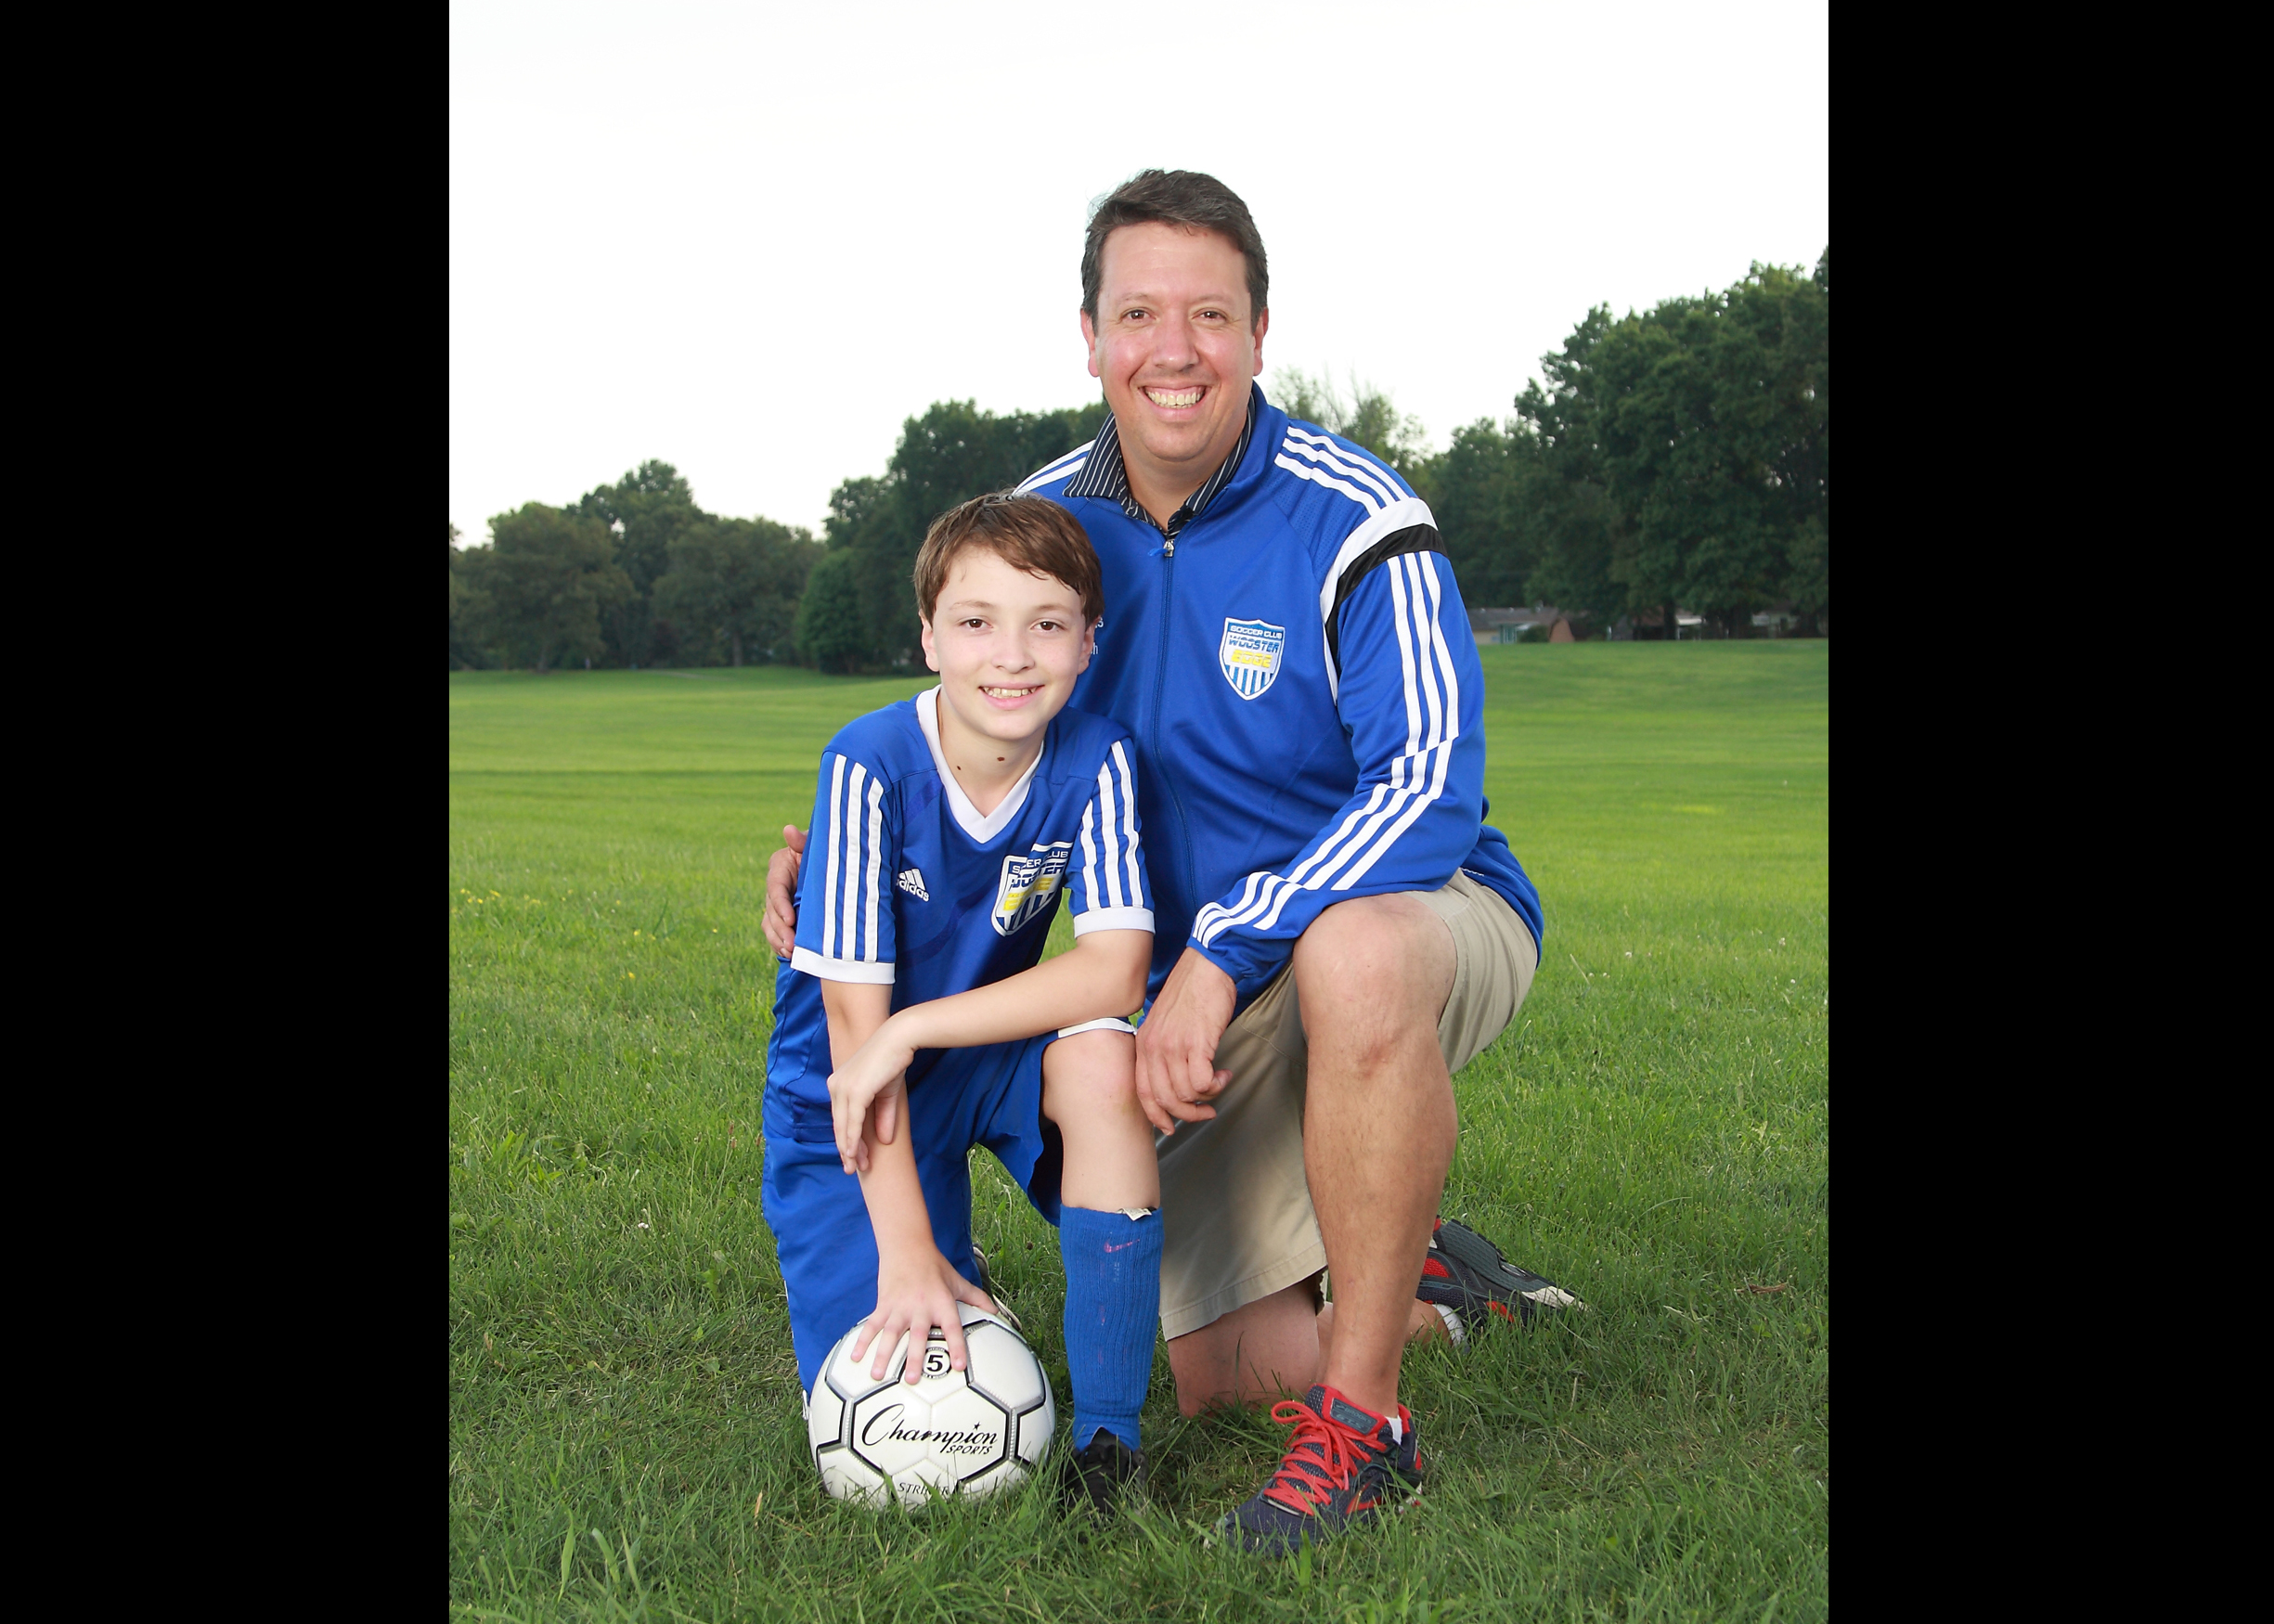 Wooster Edge Soccer